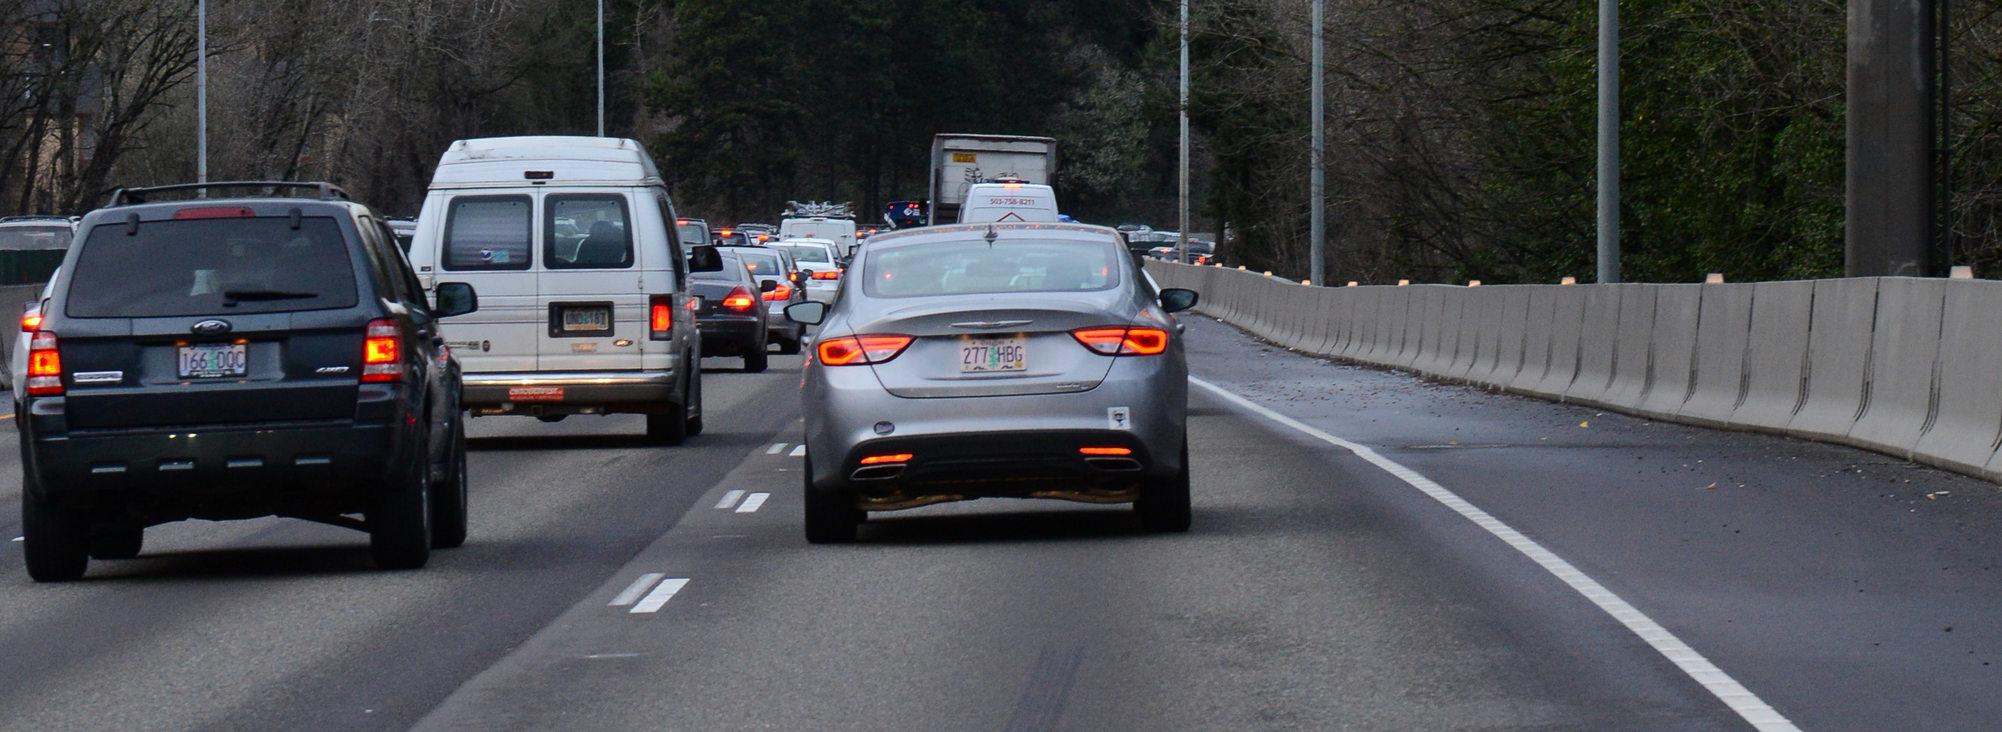 Traffic on I-5 wide